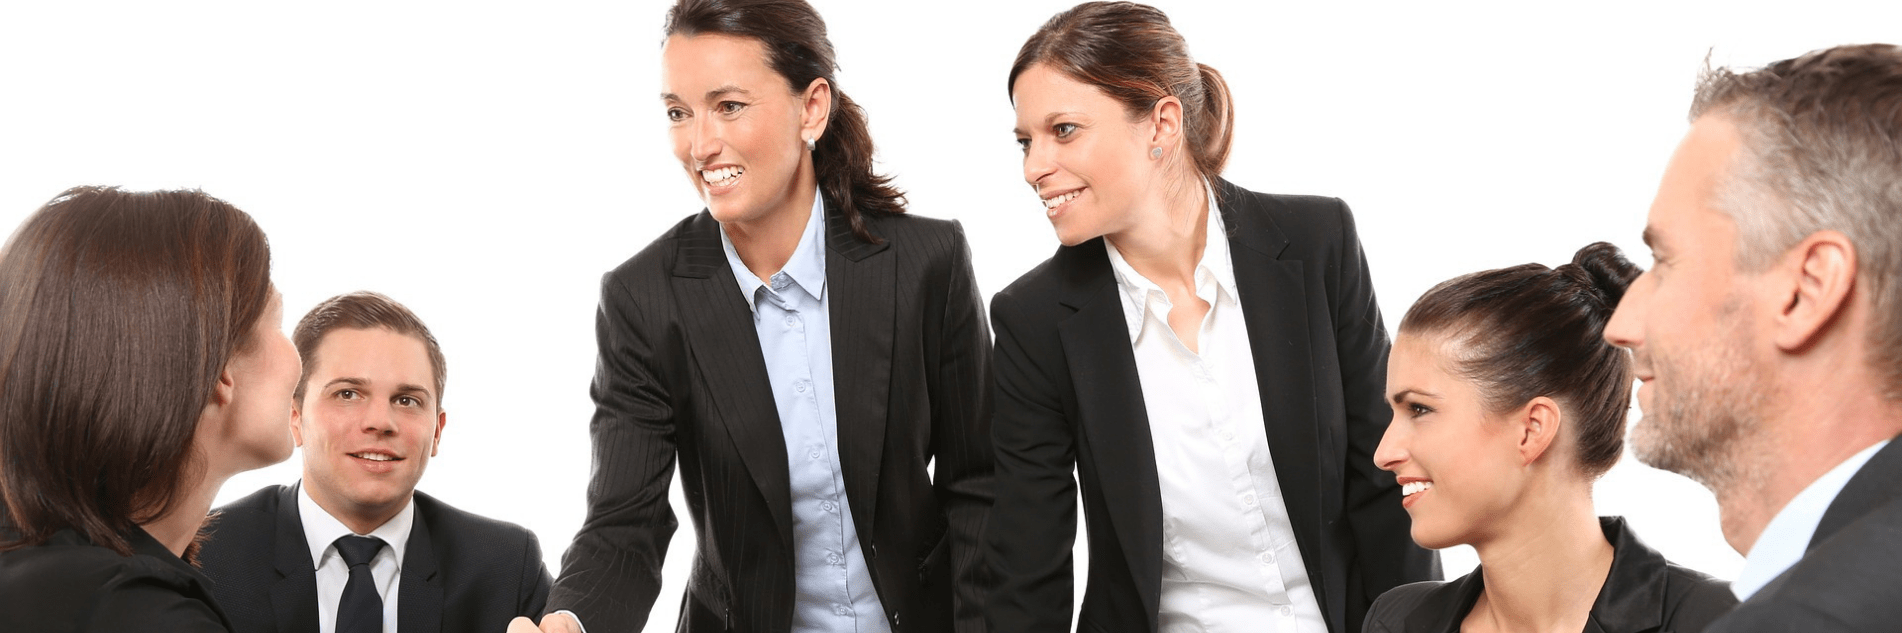 prednosti menadžerskog poziva